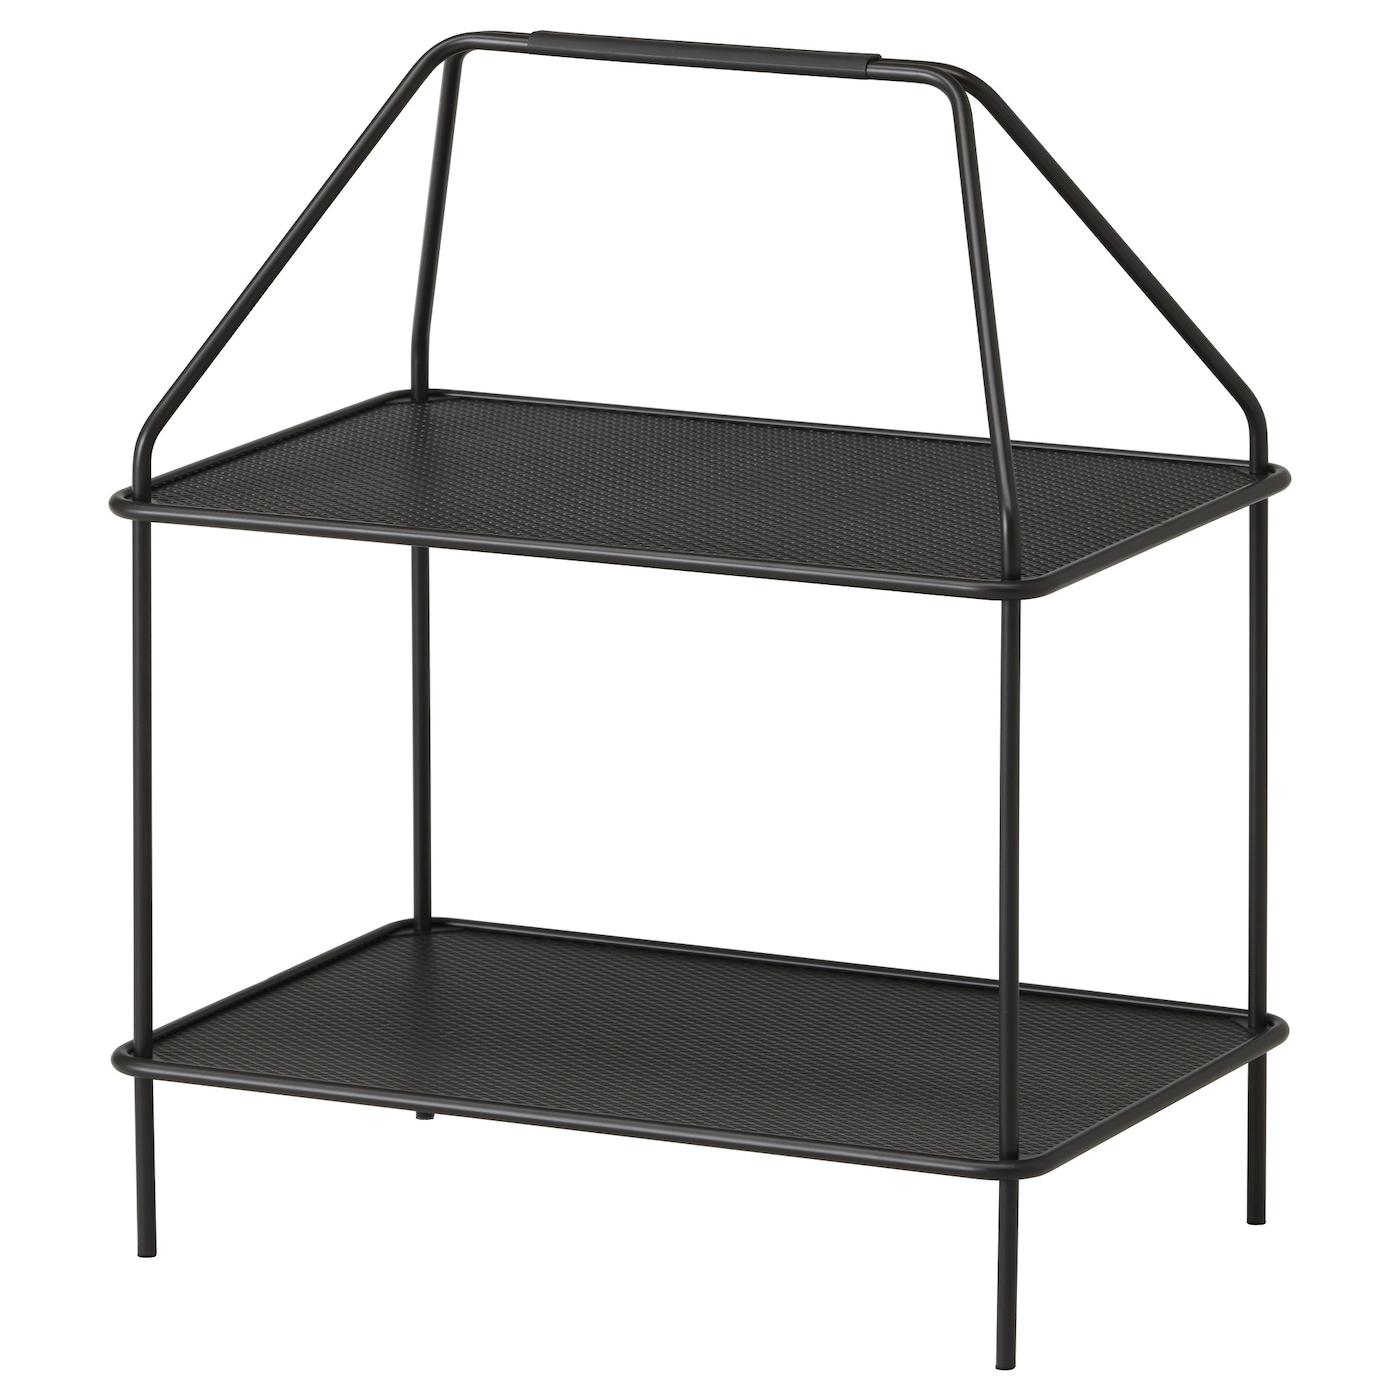 ypperlig table porte revue gris fonc 55x36 cm ikea. Black Bedroom Furniture Sets. Home Design Ideas